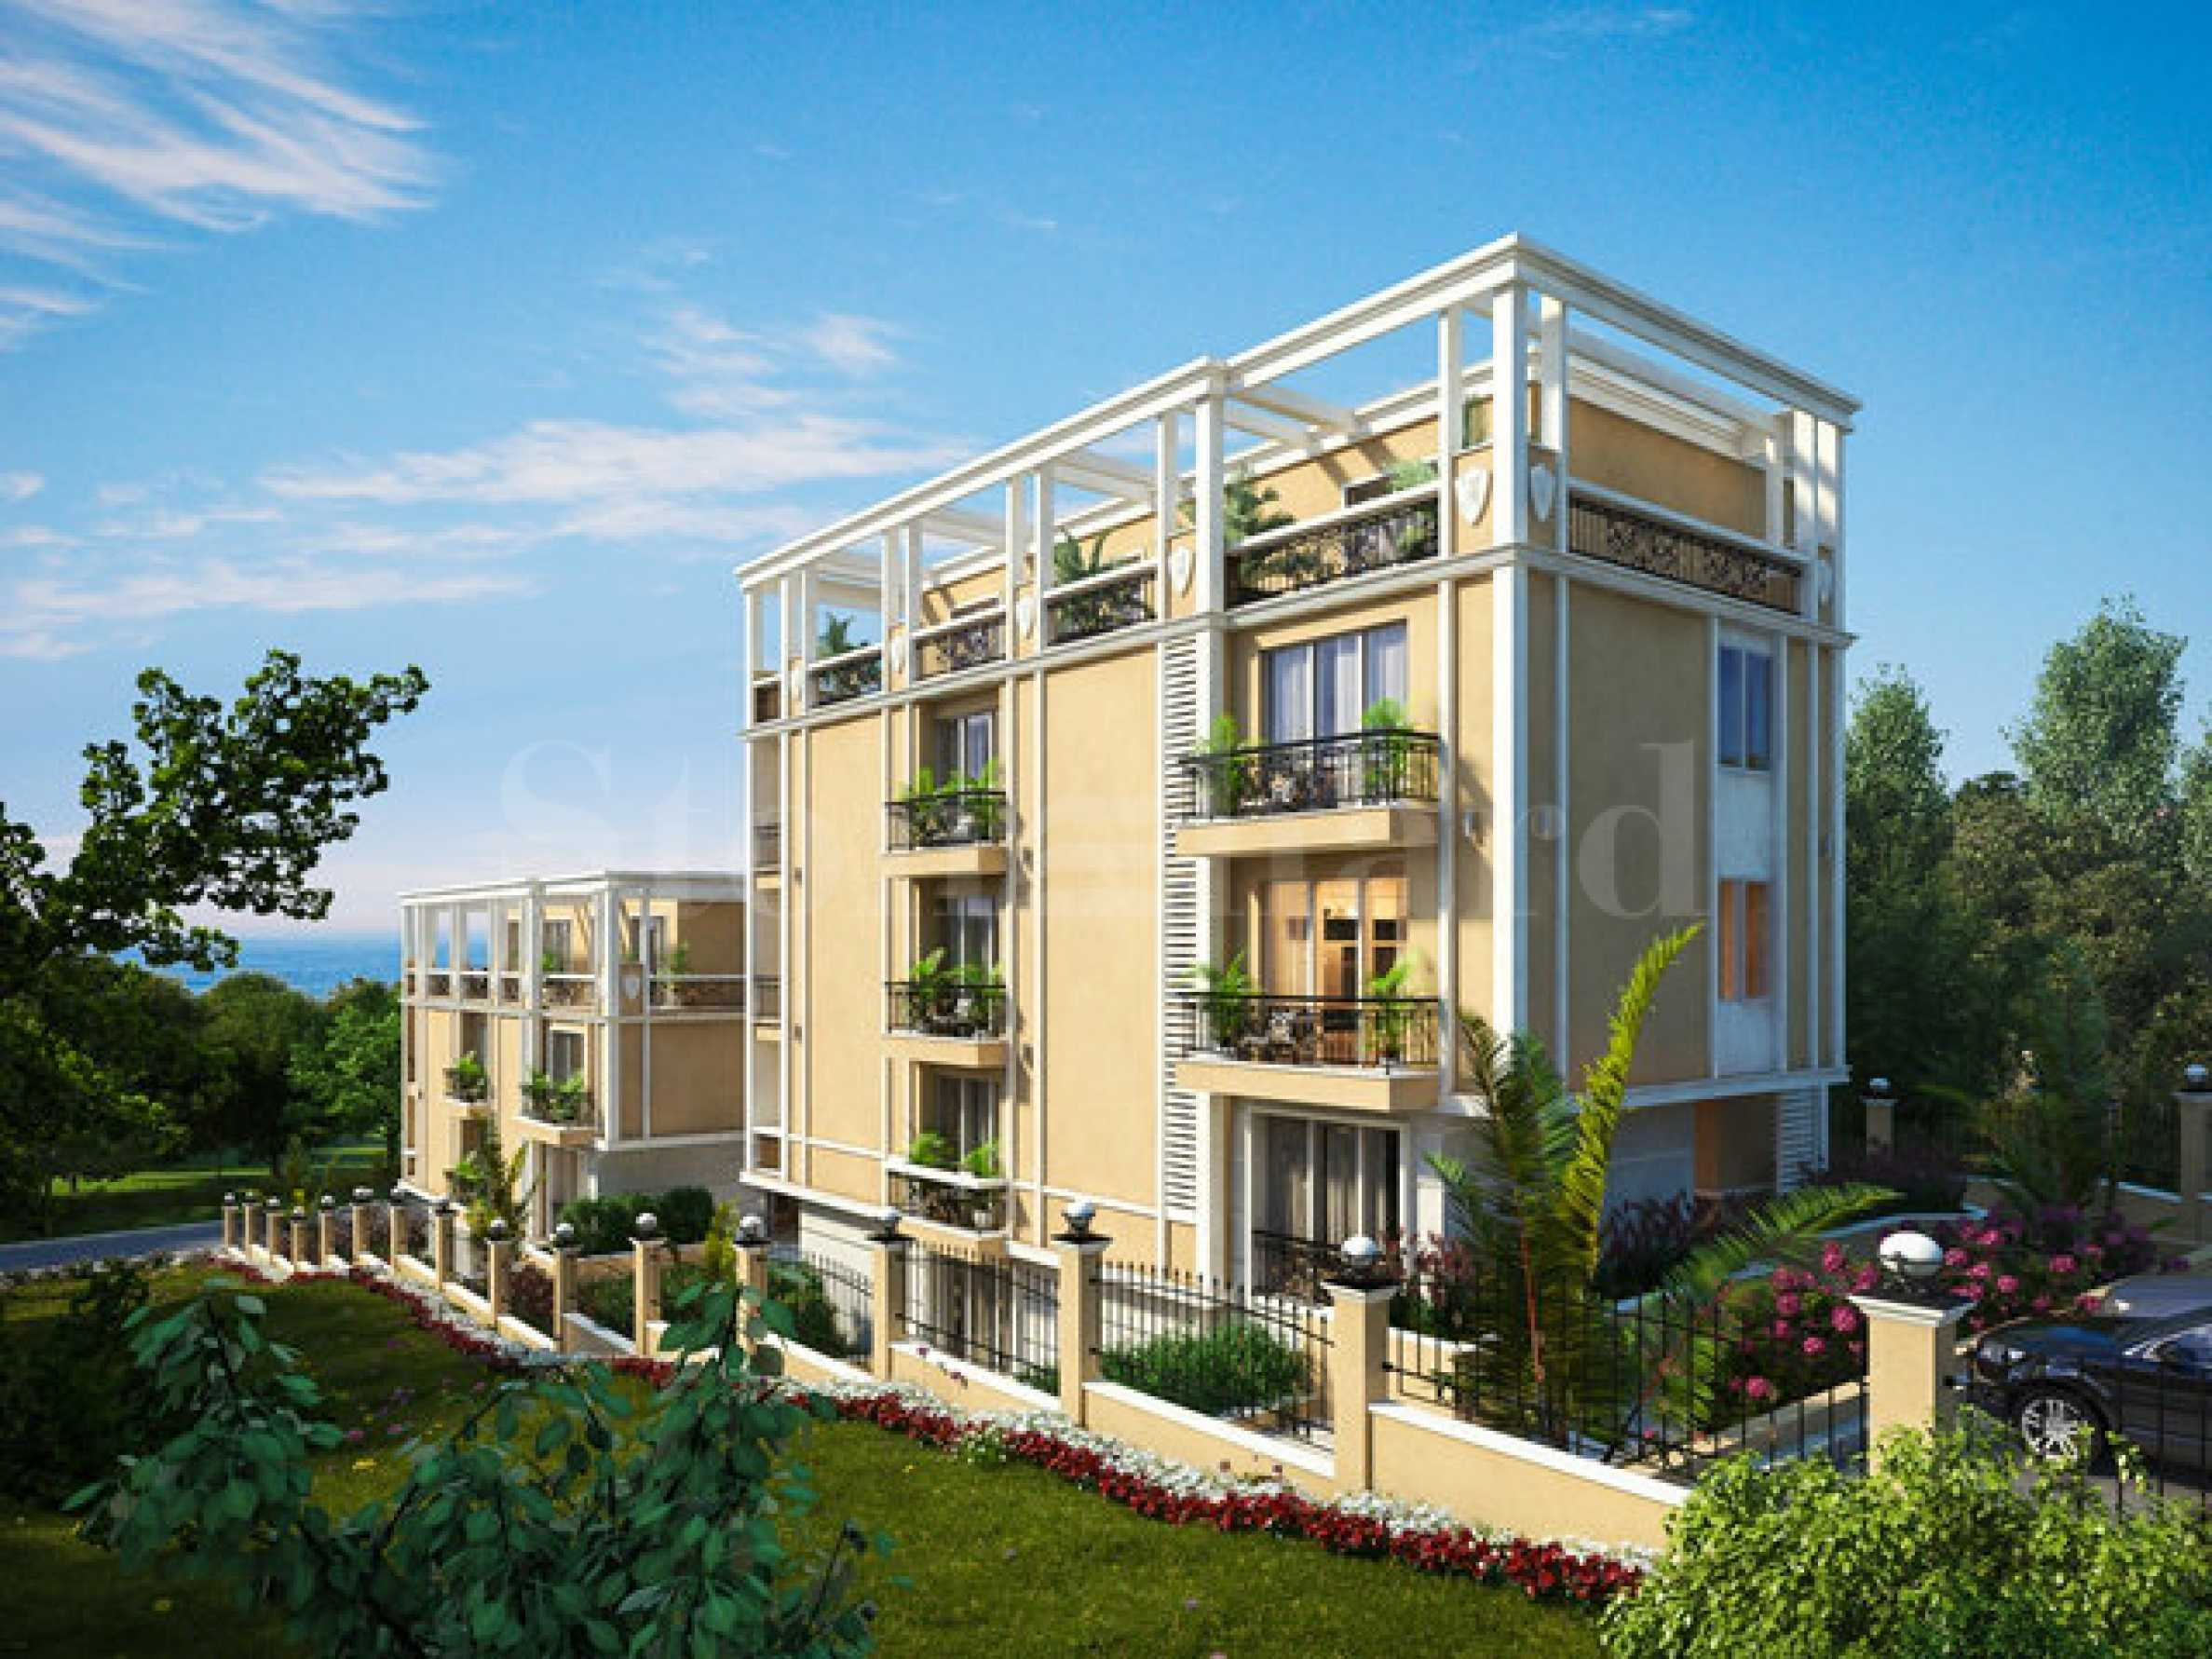 Прекрасна сграда с апартаменти в непосредствена близост до плажа1 - Stonehard